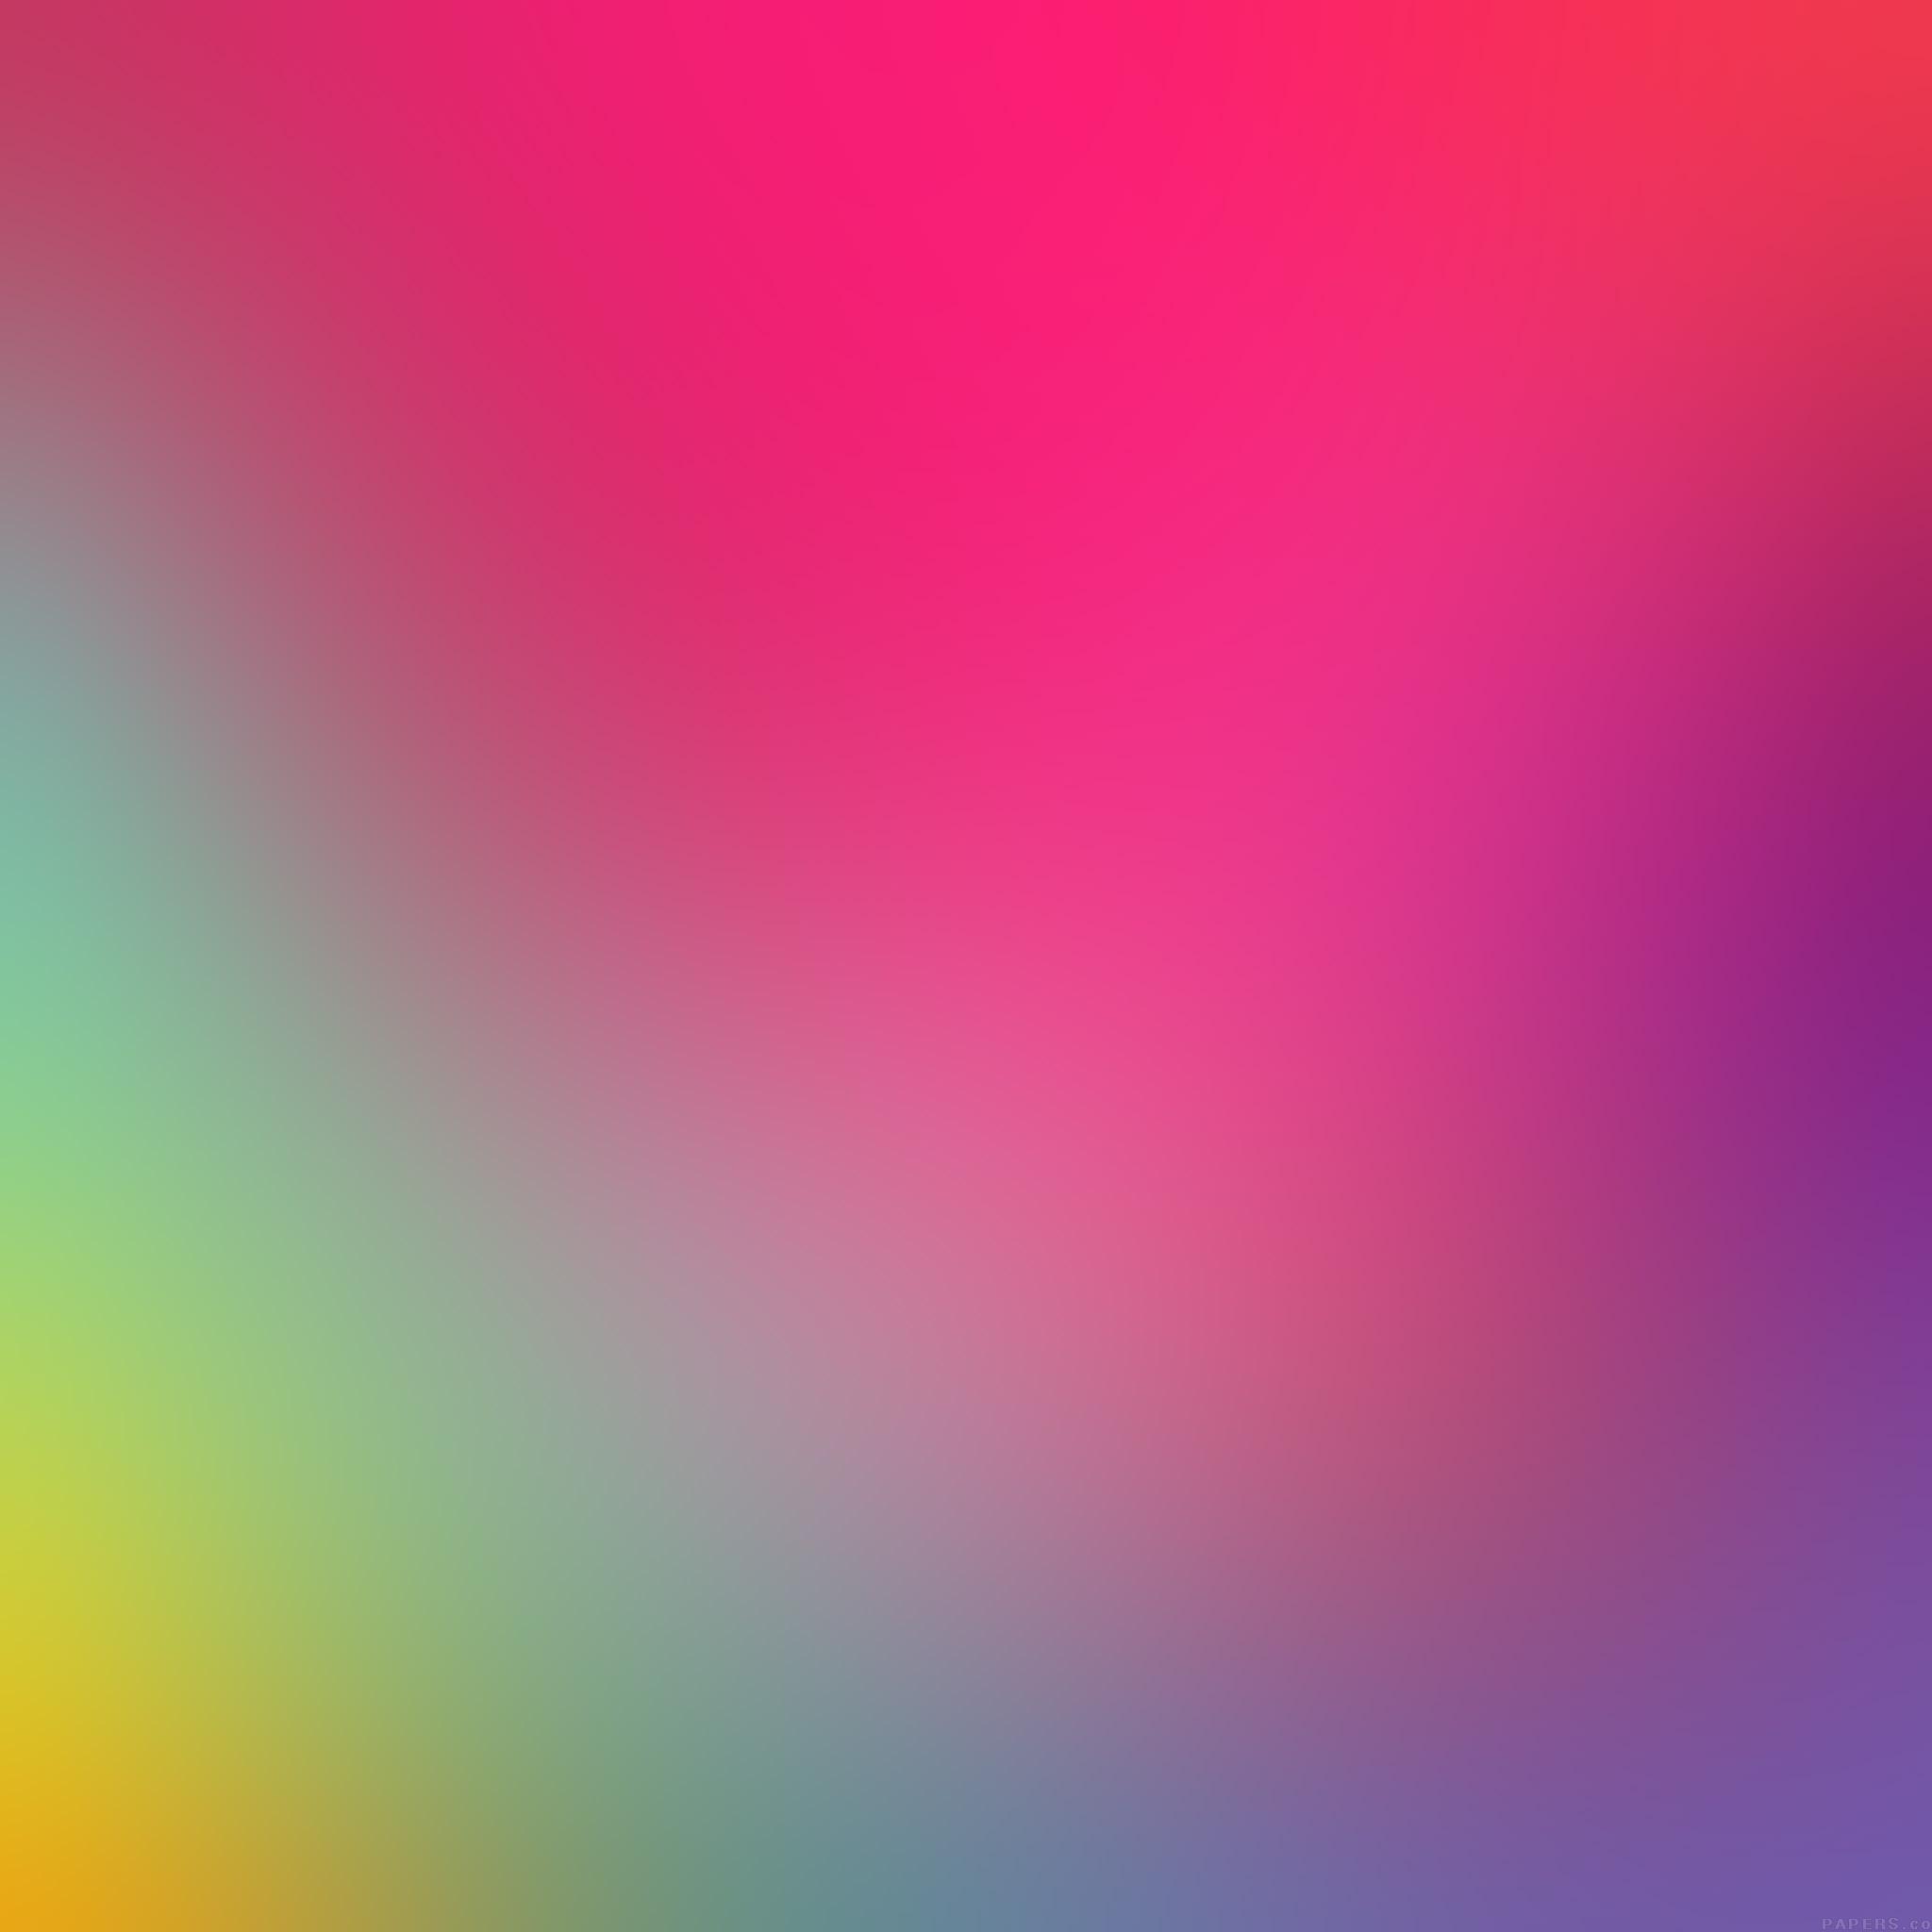 Se78 fantastic color red gradation blur - Color gradation wallpaper ...